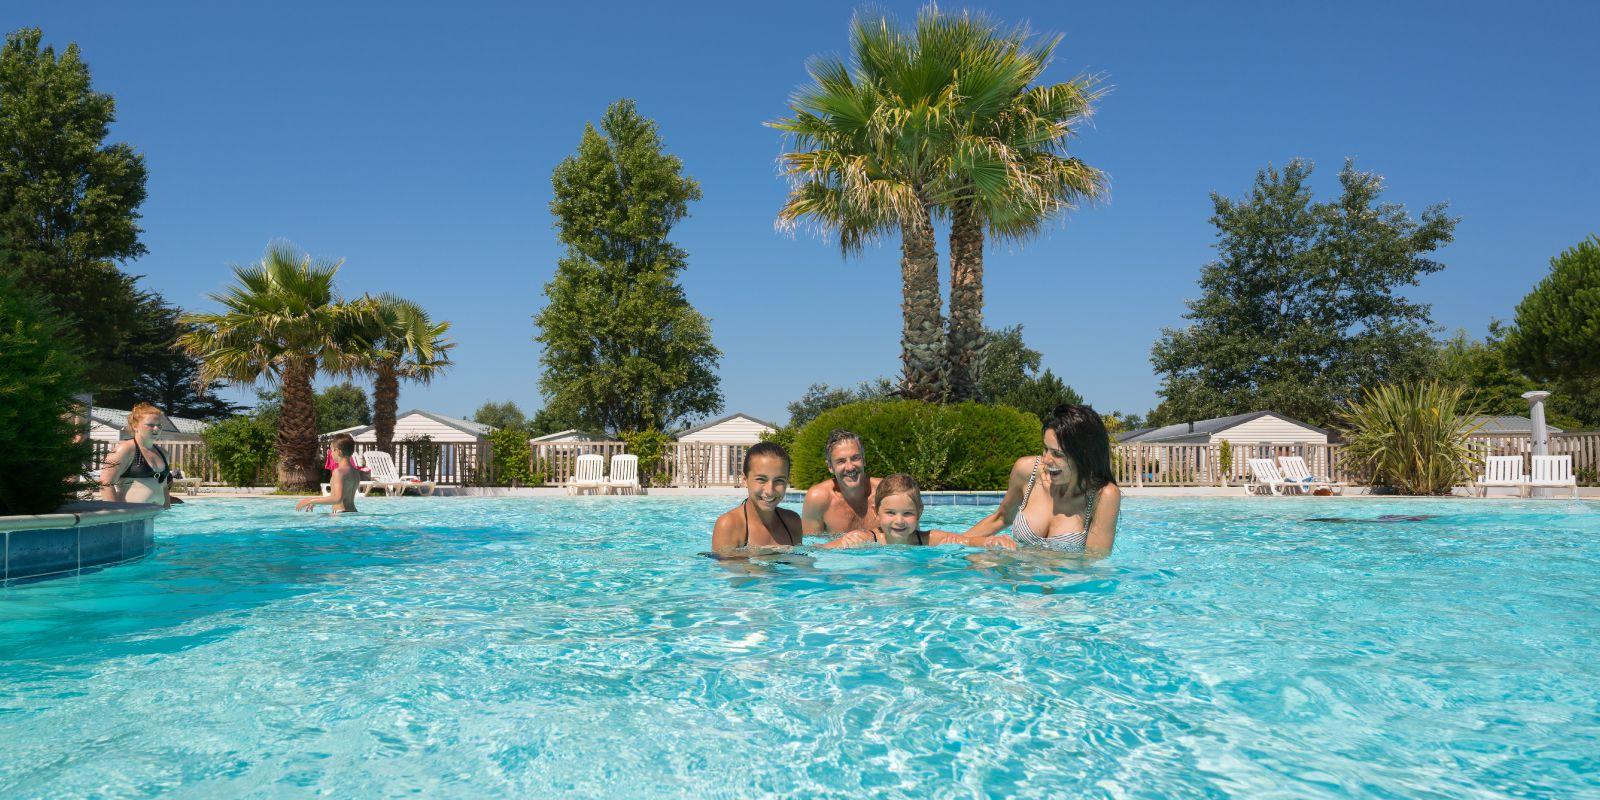 Image plage bretagne photos camping bretagne avec for Bretagne piscine